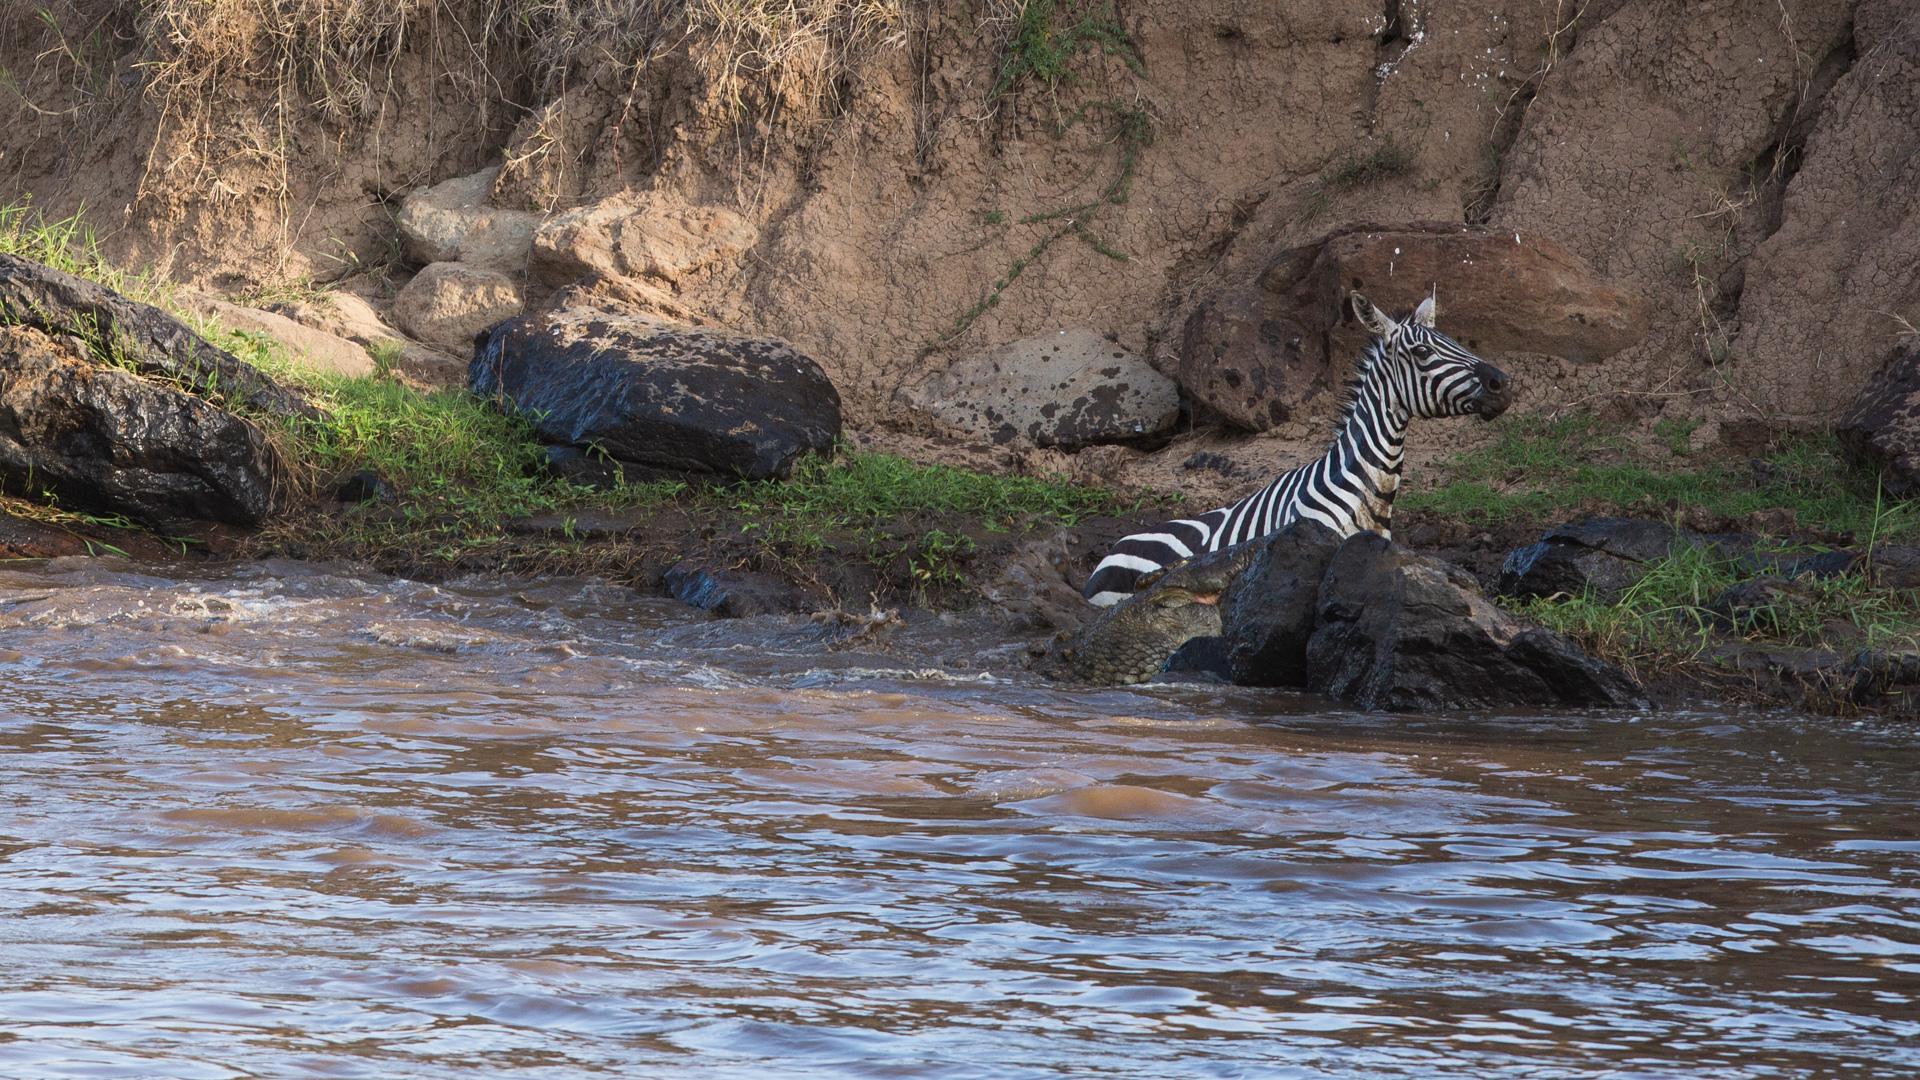 Zebra loses battle to crocodiles